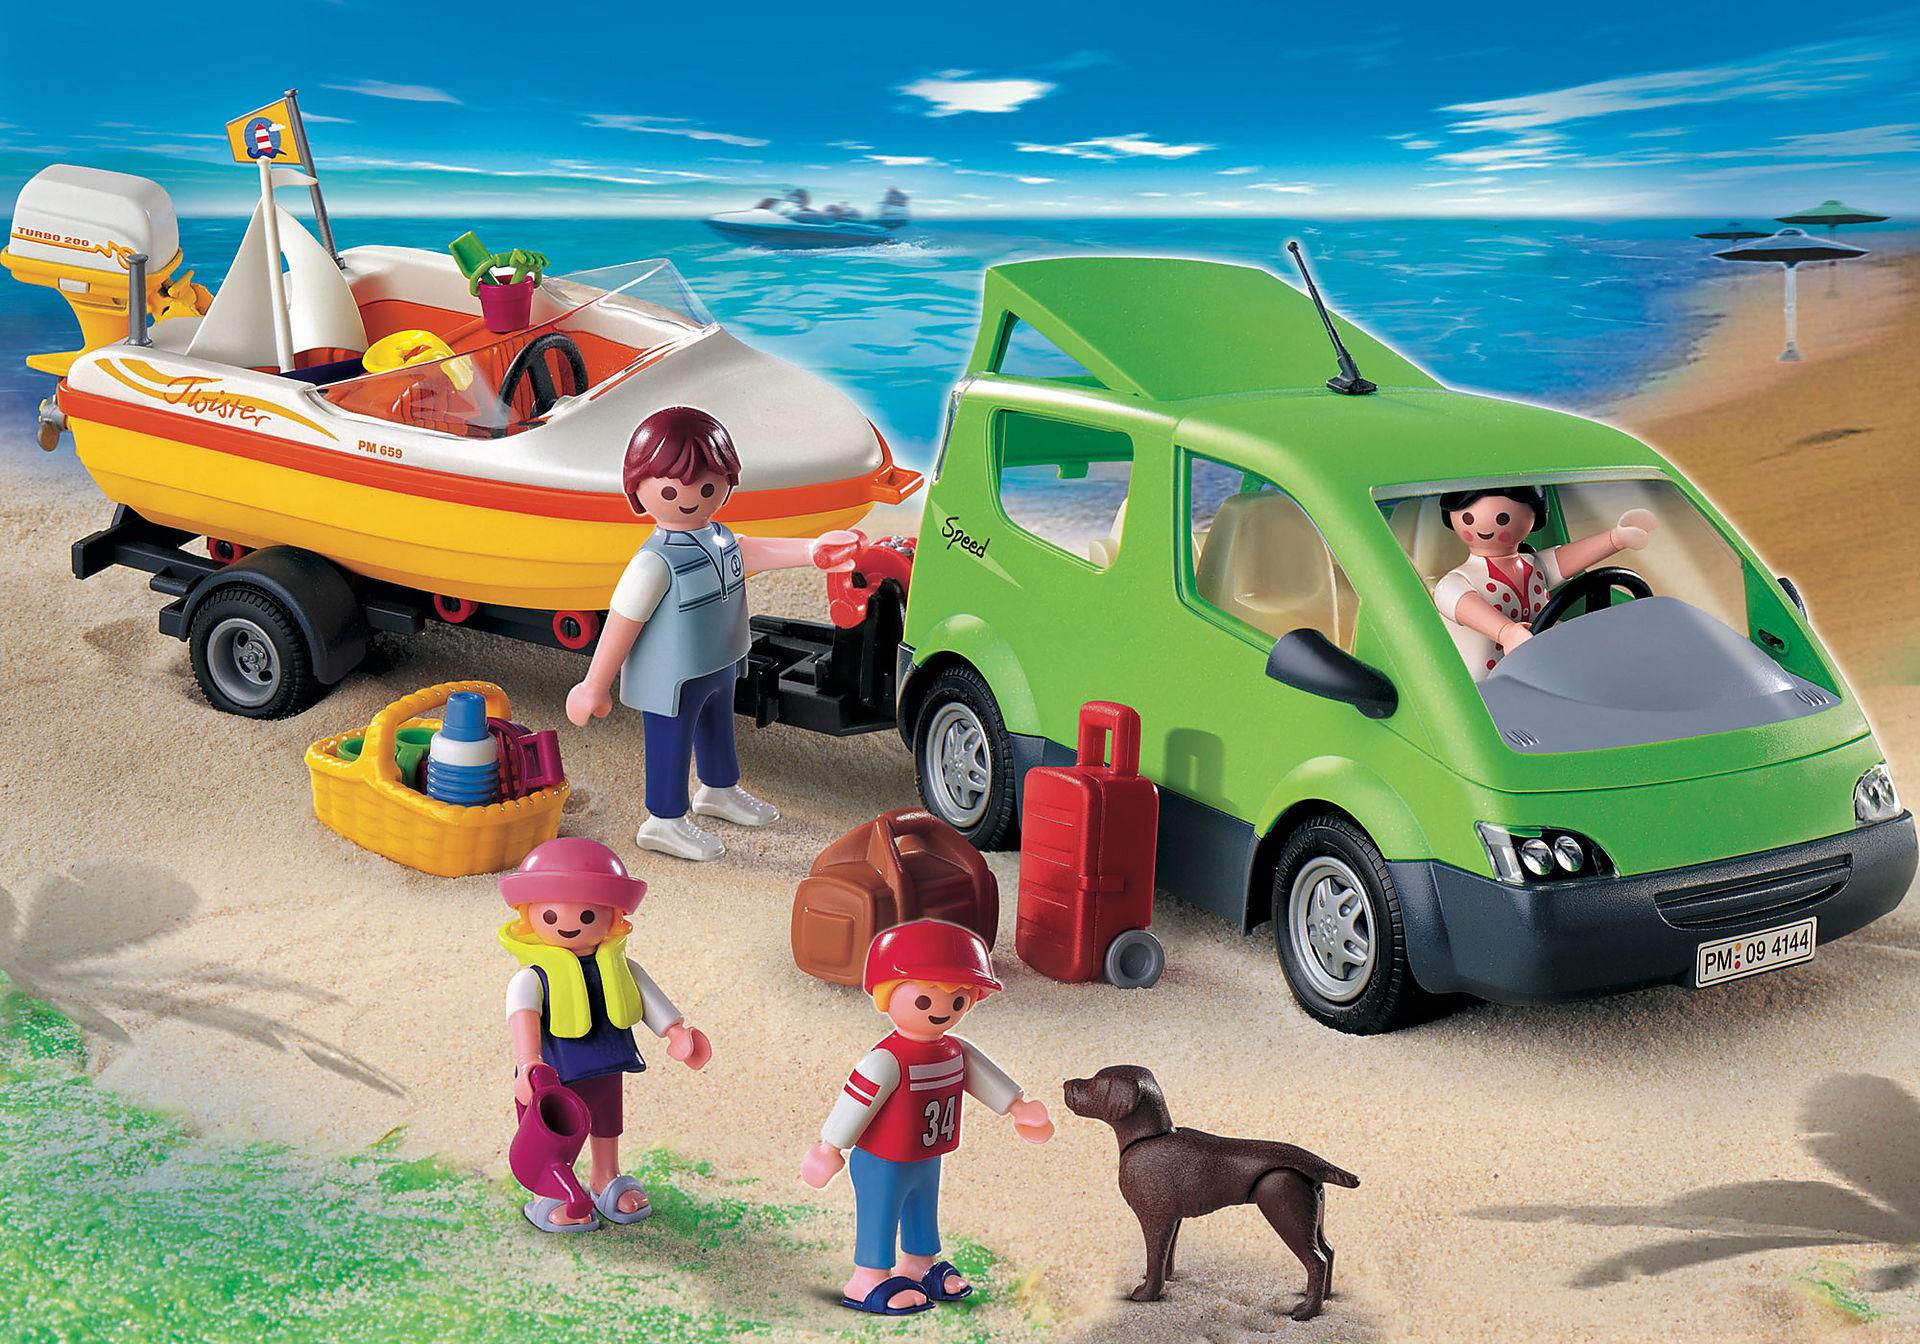 http://media.playmobil.com/i/playmobil/4144_product_detail/Gezinswagen met speedboot